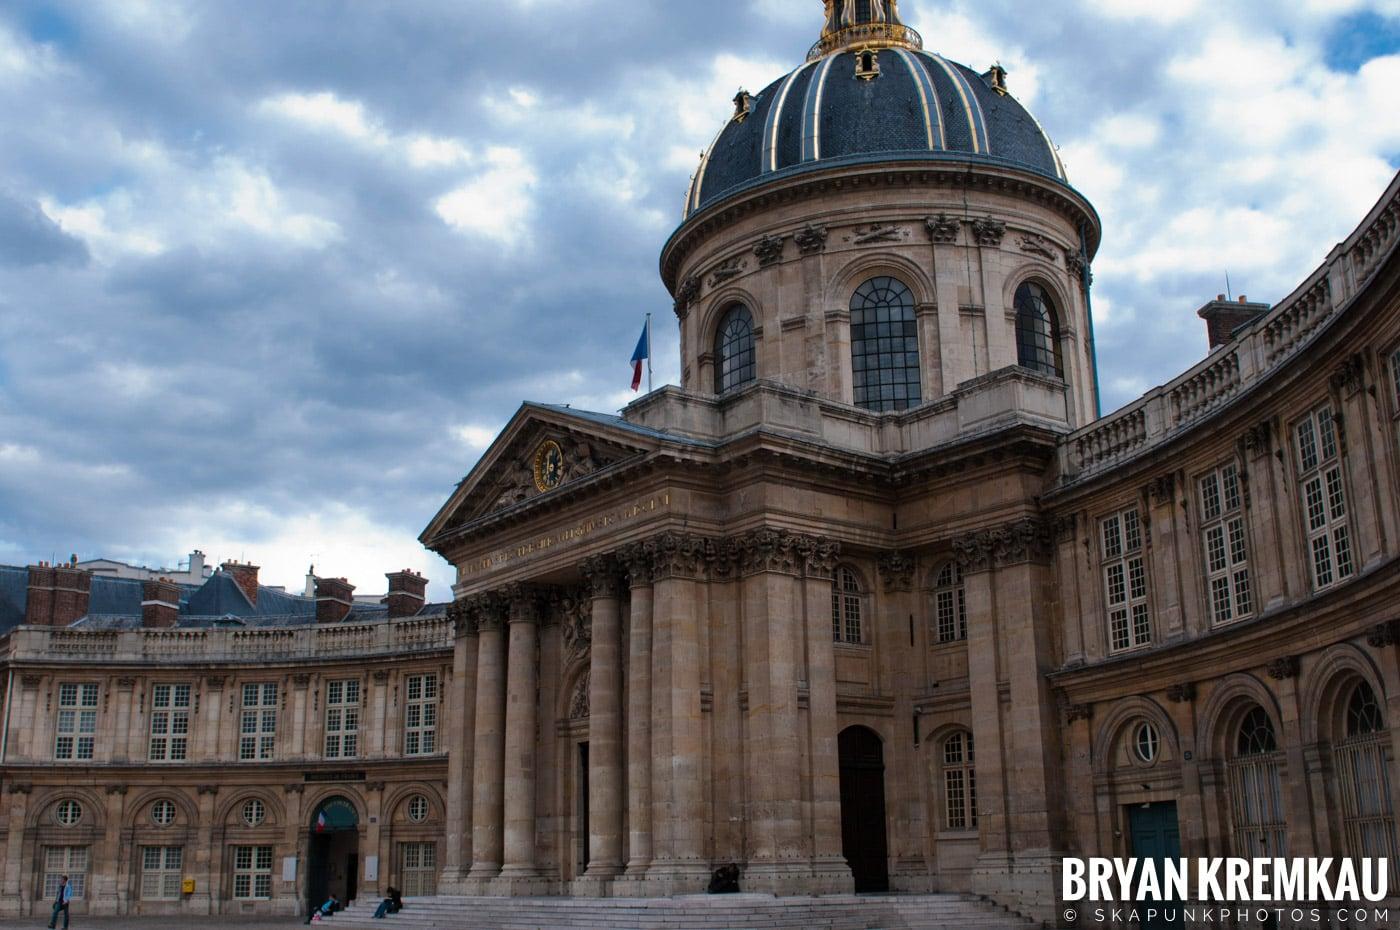 Paris, France Honeymoon - Day 1 - 7.18.11 (11)